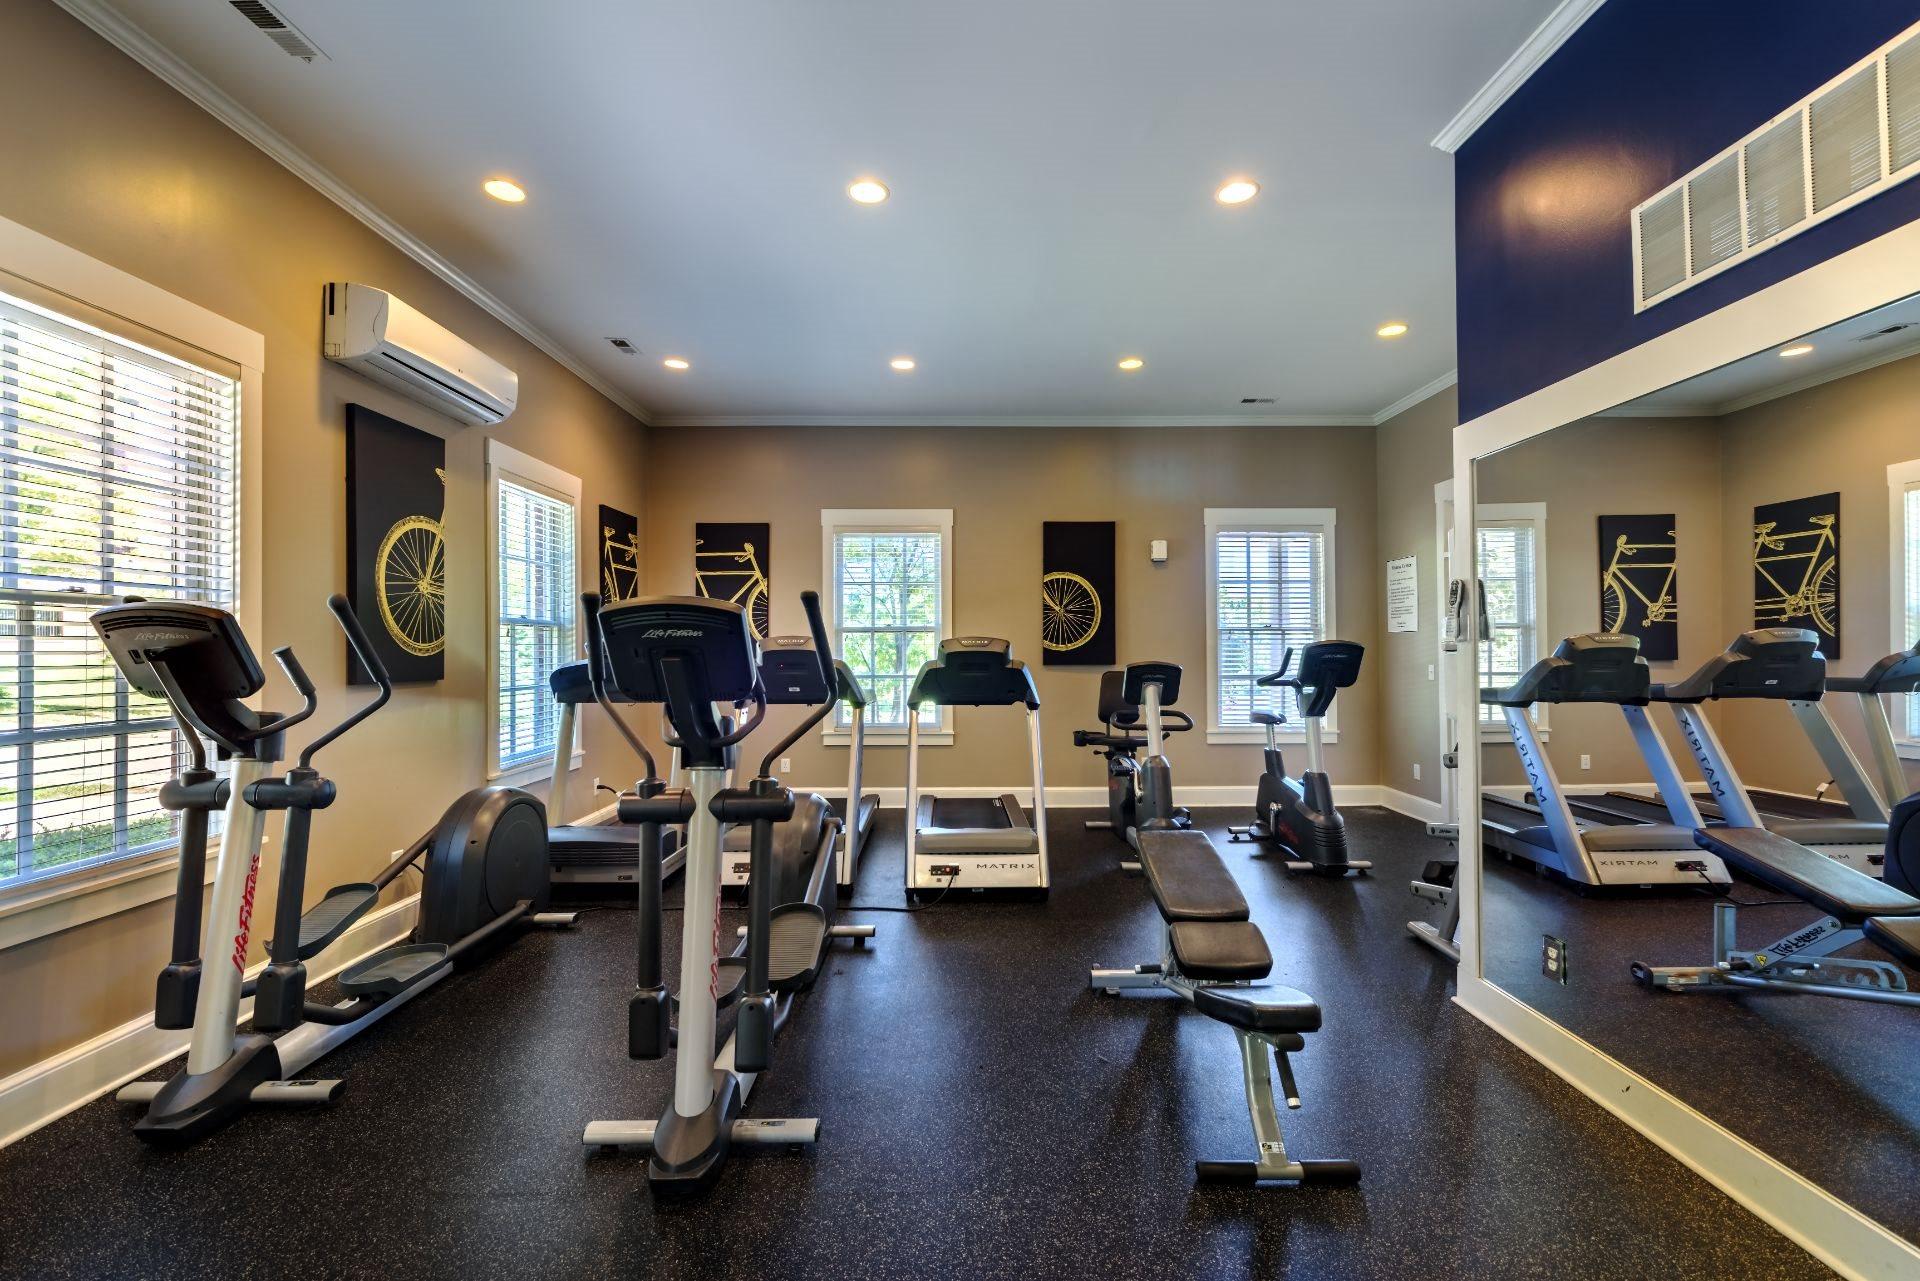 Fitness Center Christopher Wren Apartments, 501 Christopher Wren Drive, Wexford, PA 15090